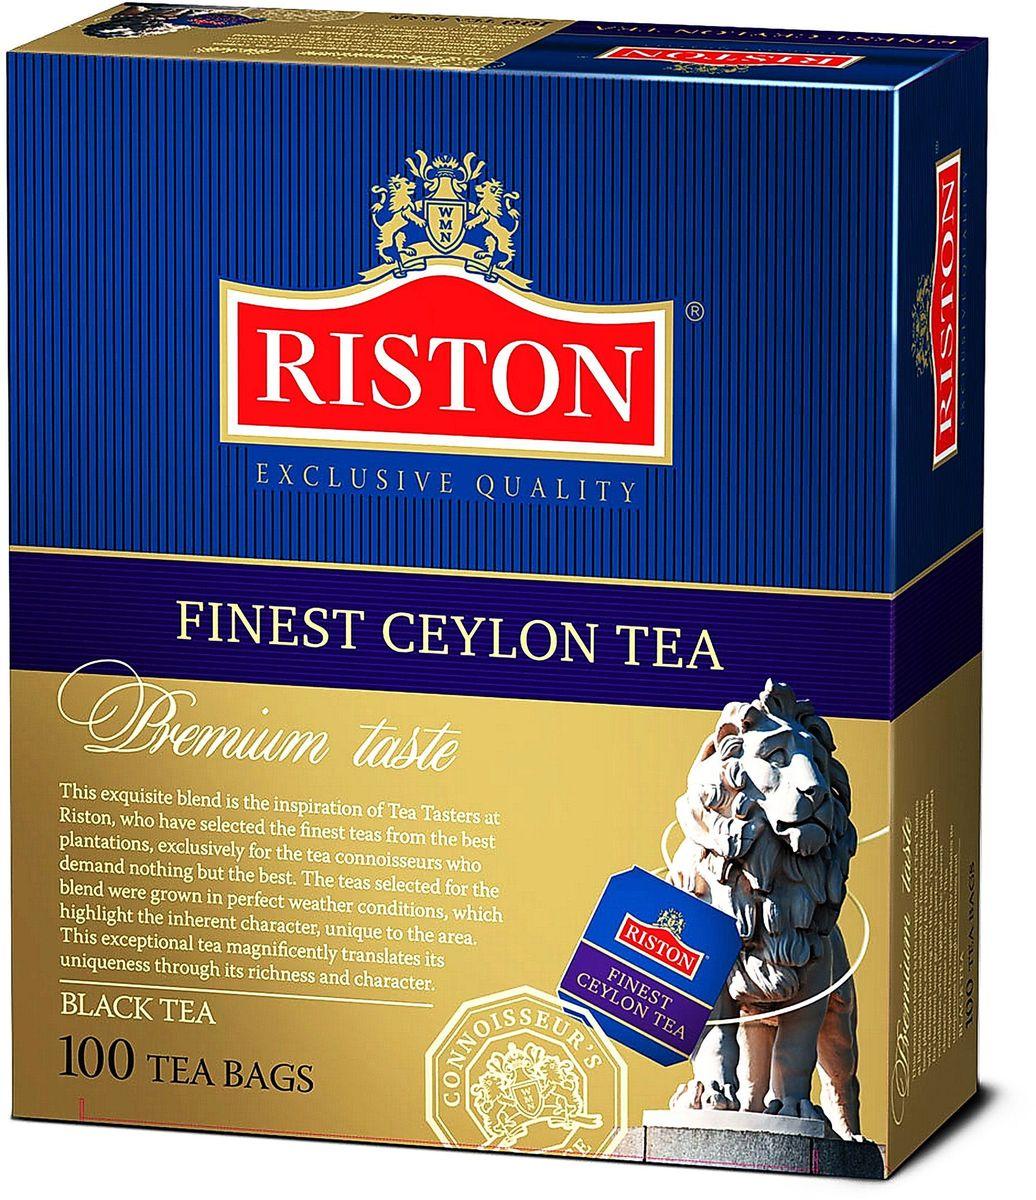 Riston Файнест Цейлон черный чай в пакетиках, 100 шт сикварц файнест в москве